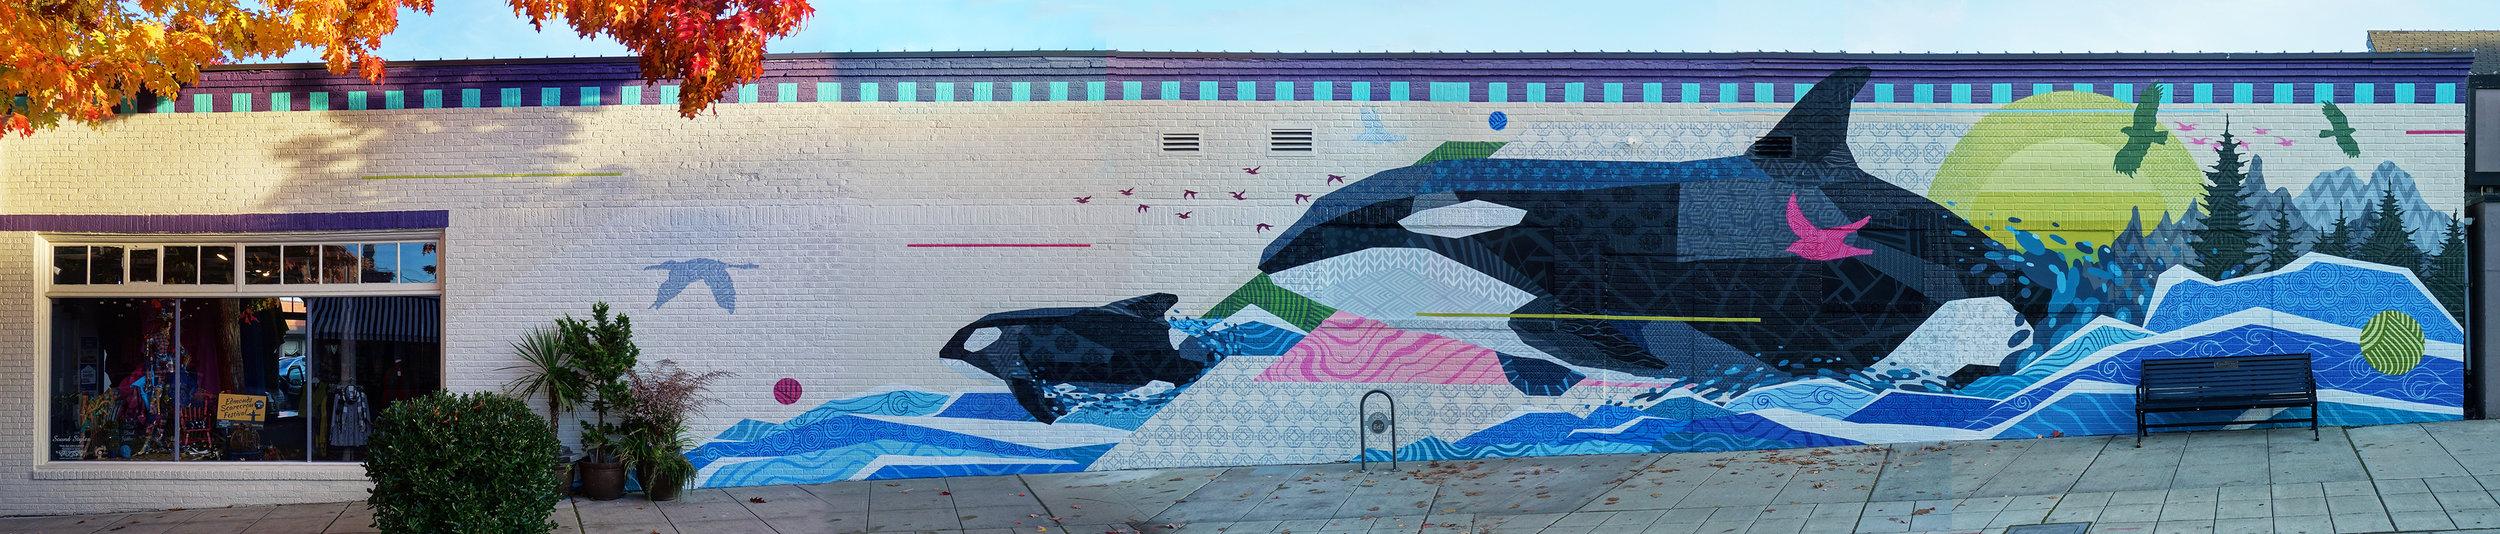 Edmonds Ocra Mural - Full Wall.jpg